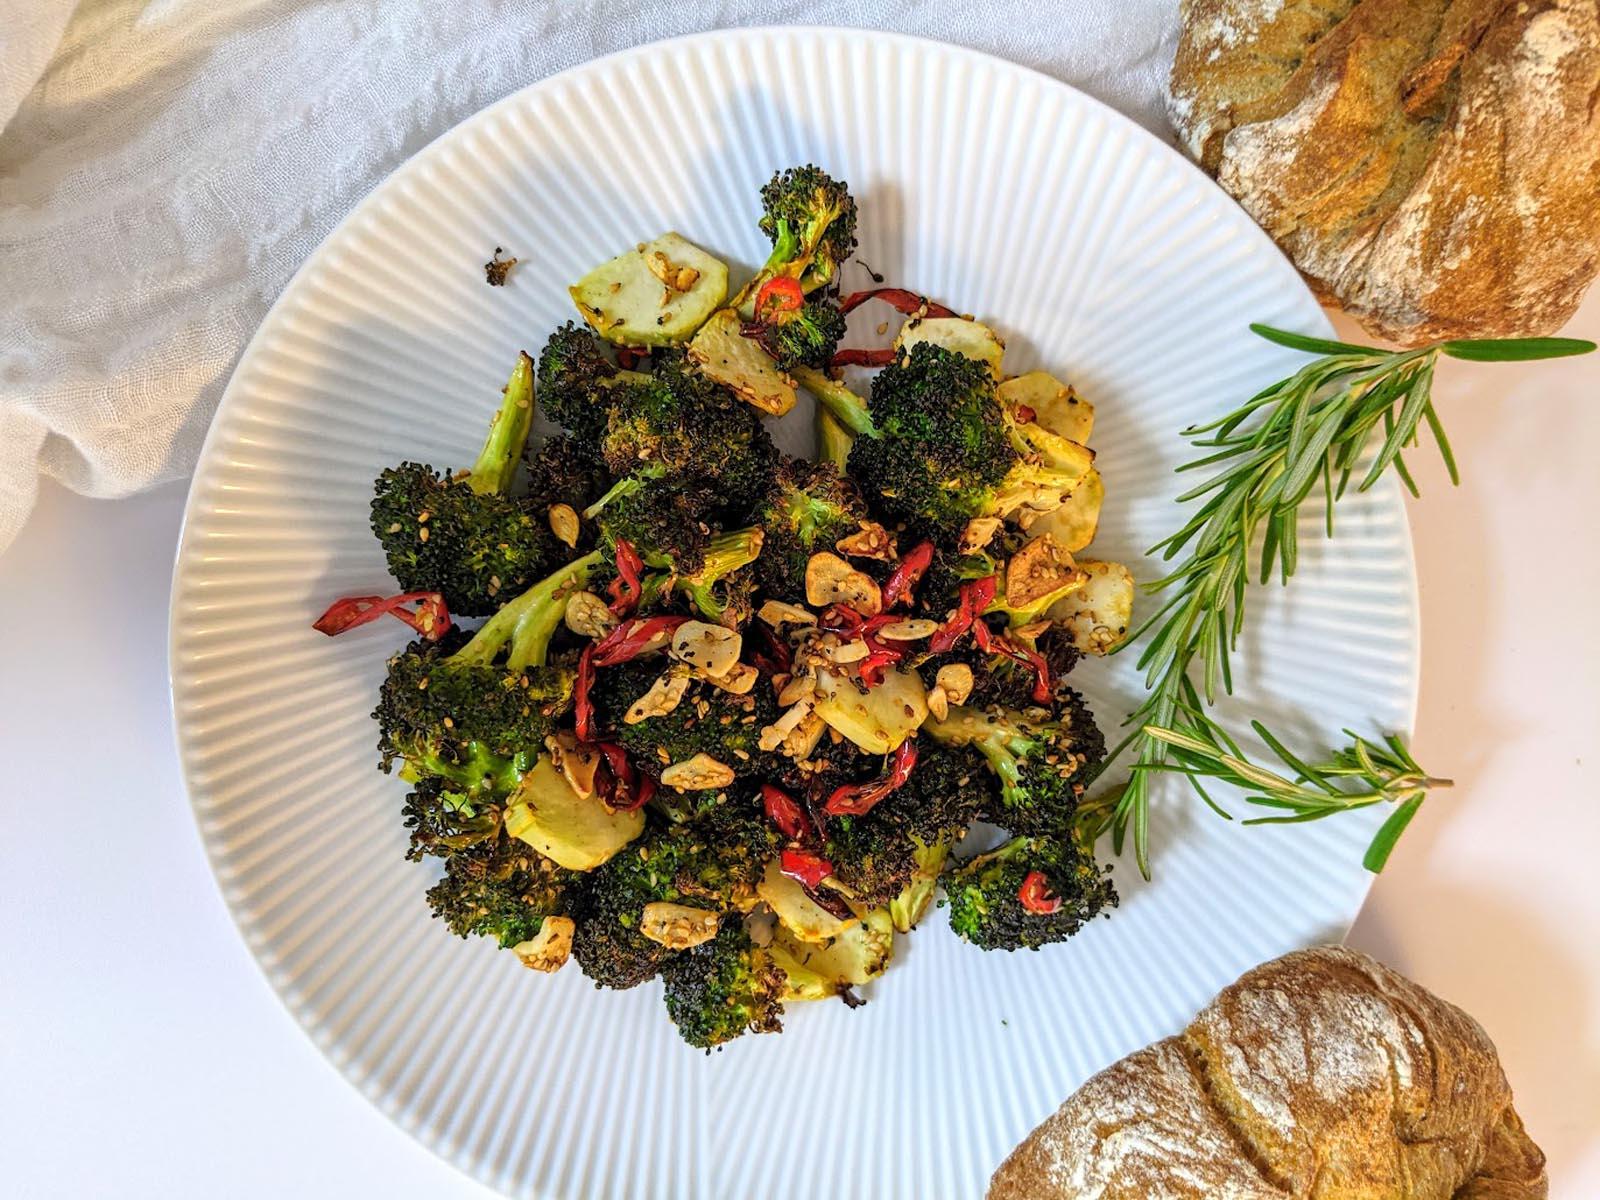 Gerösteter Brokkoli aus der Heißluftfritteuse - Titel - BellsWelt